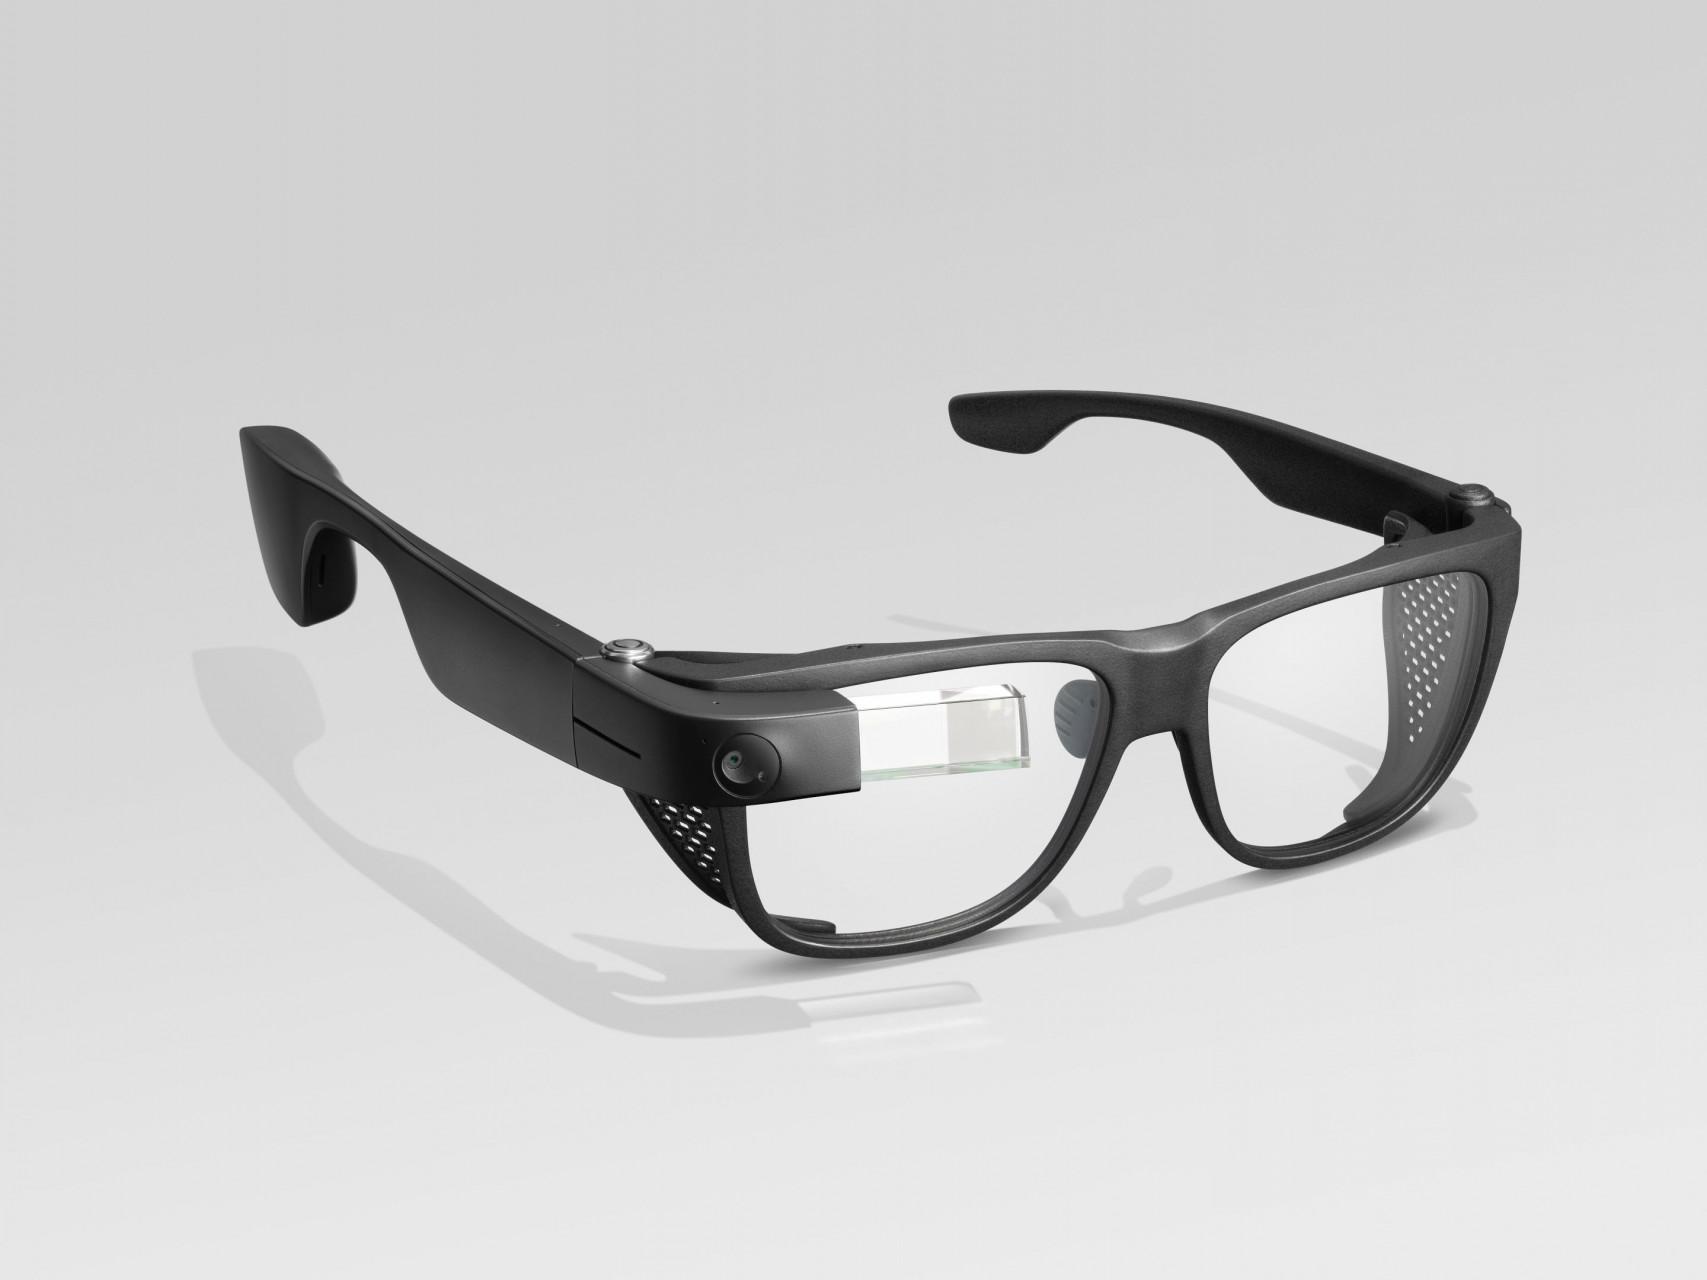 Google 公布新一代 Glass 增强现实眼镜,要价 999 美元_Edition